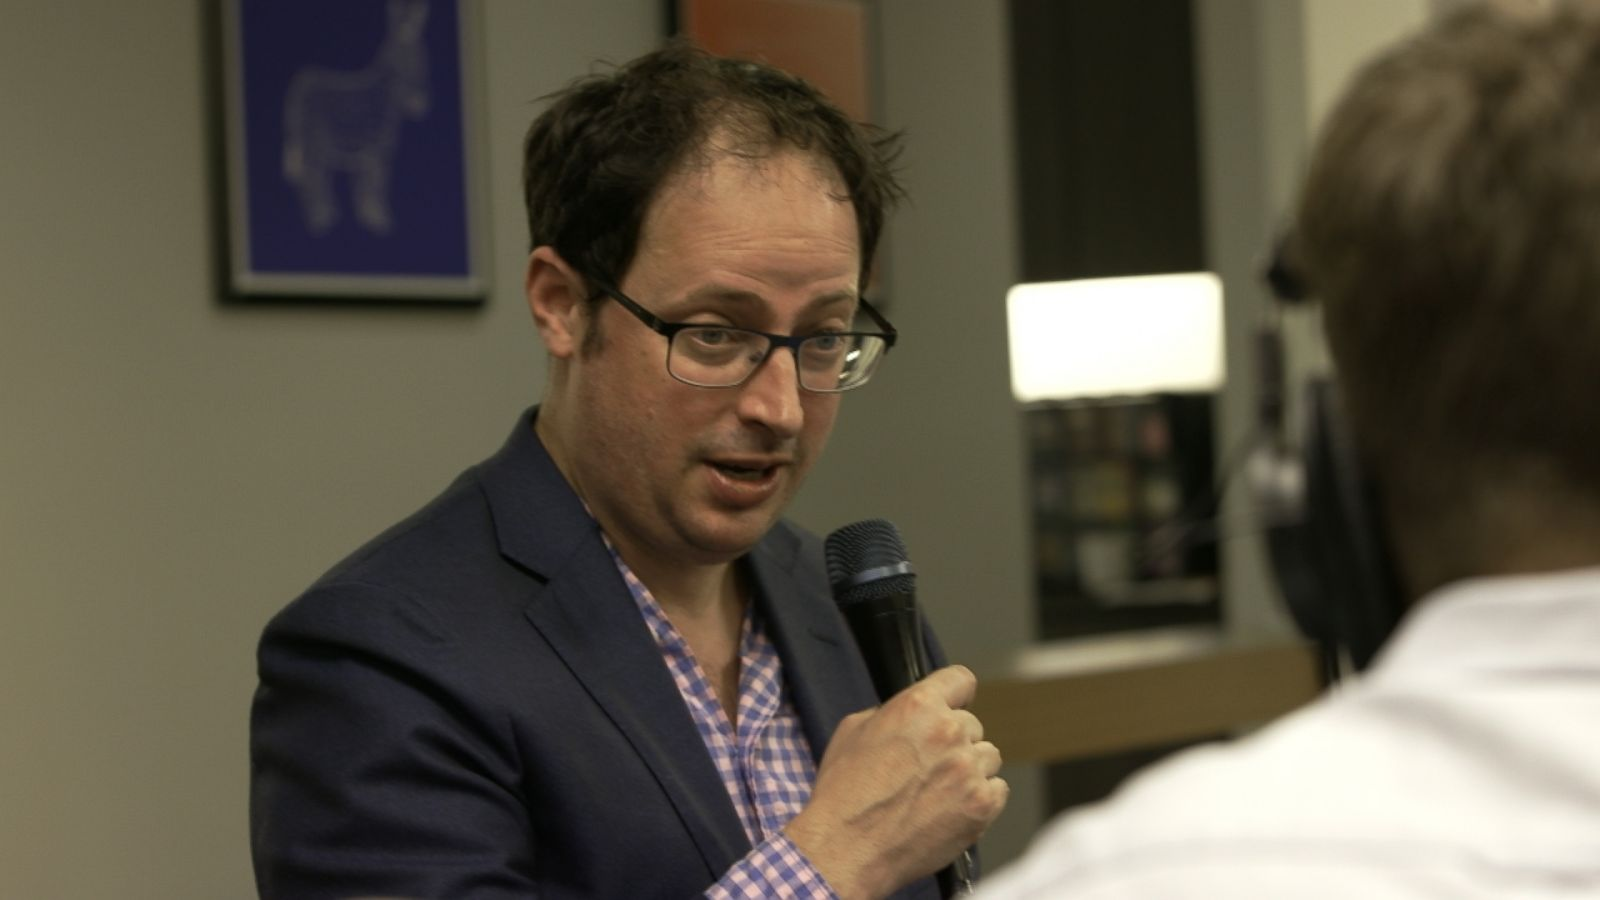 Video: FiveThirtyEight's Politics Crew Analyzes The Debate